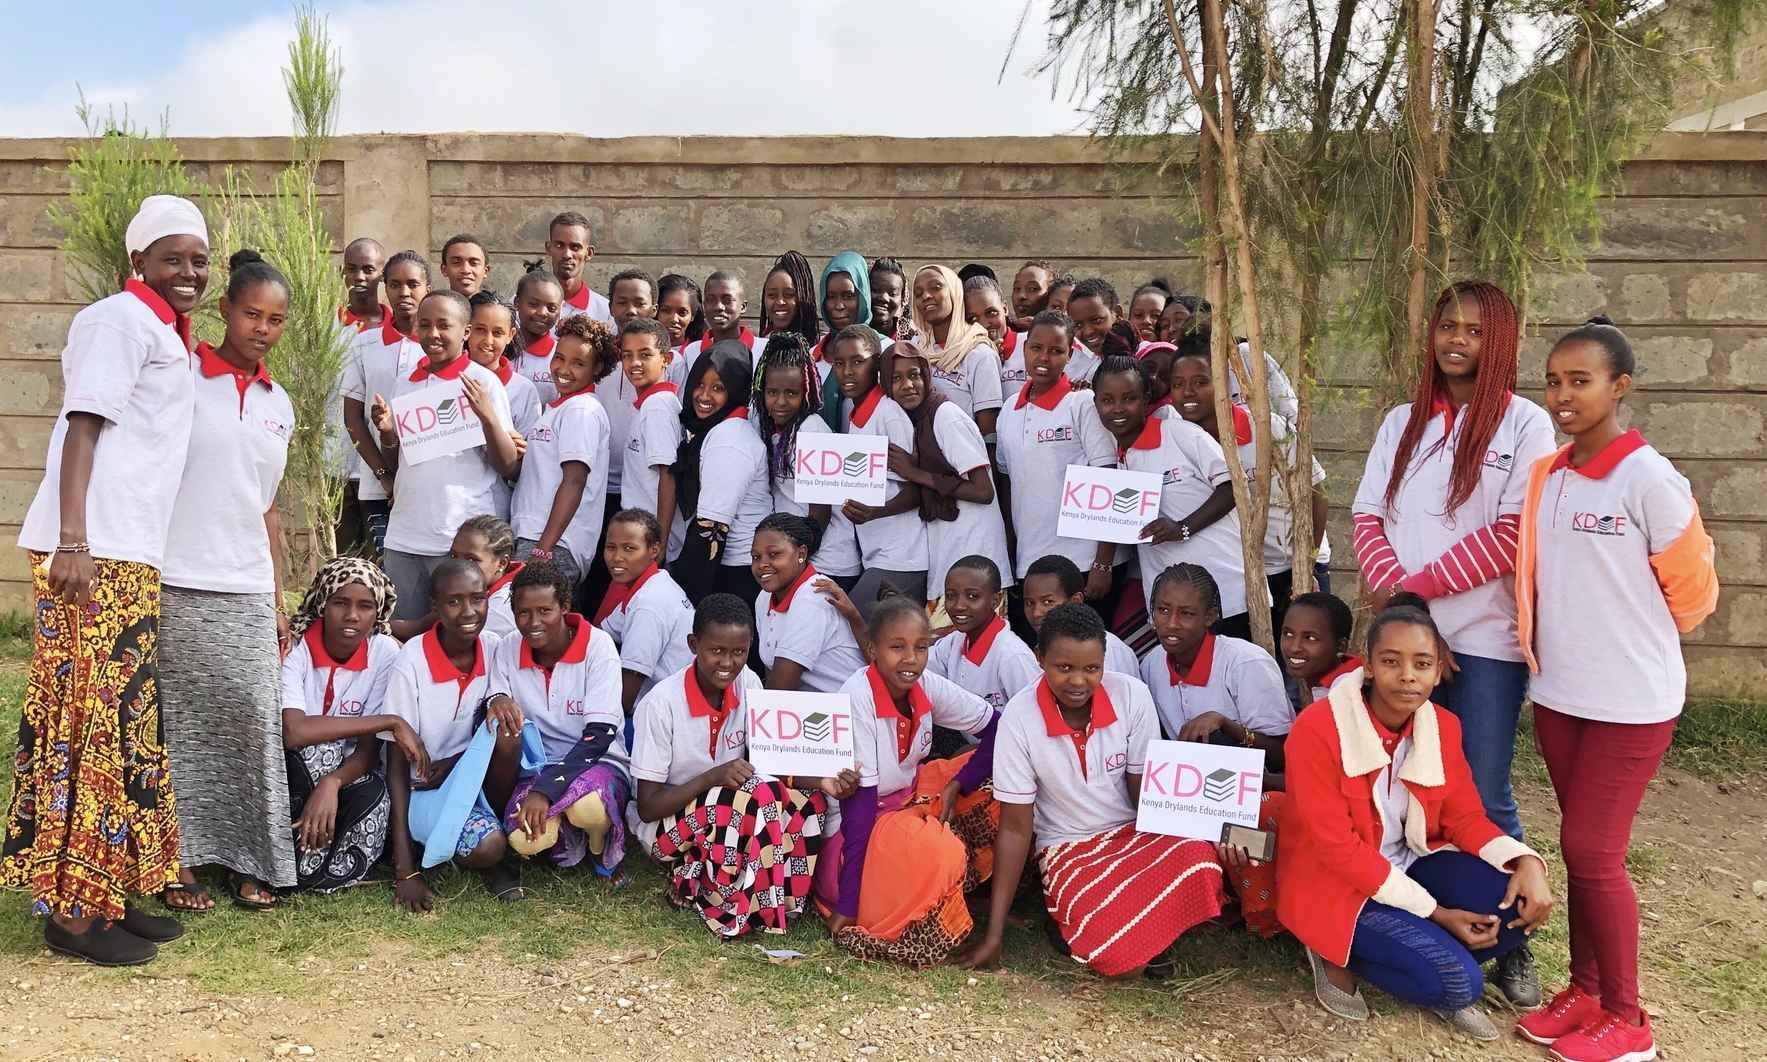 Donate towards KDEF's Annual Mentorship Program image